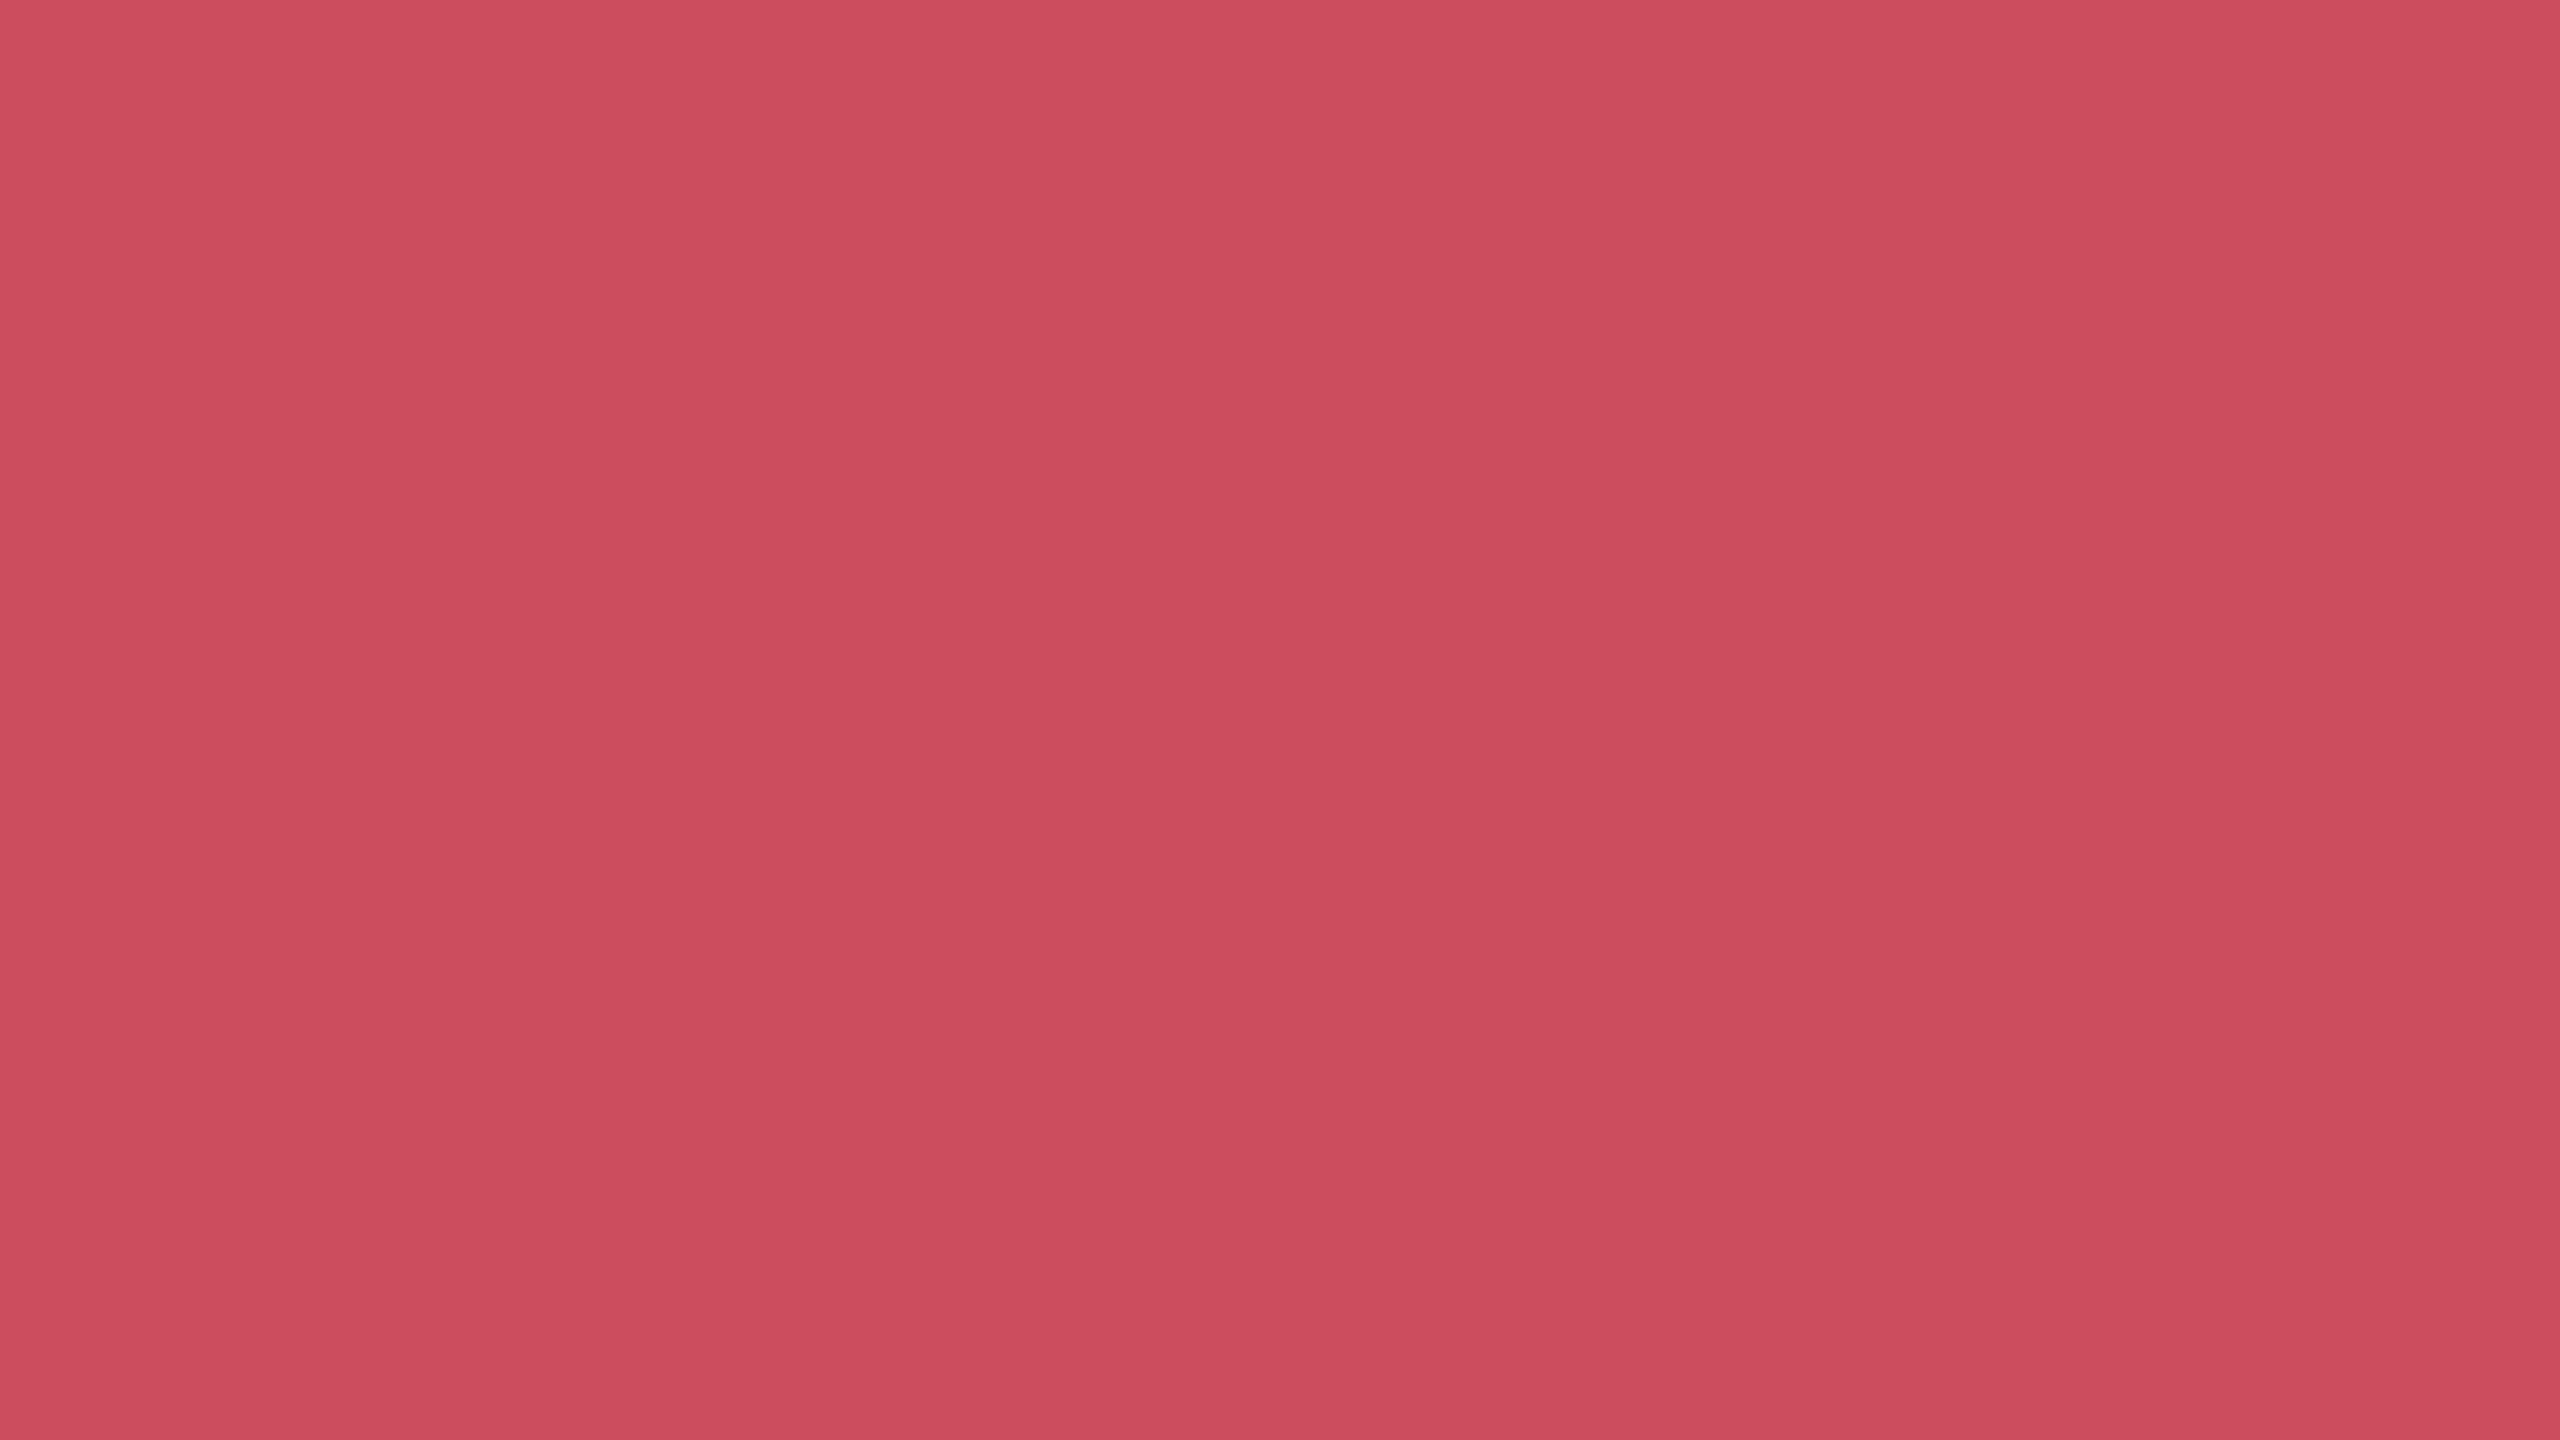 2560x1440 Dark Terra Cotta Solid Color Background